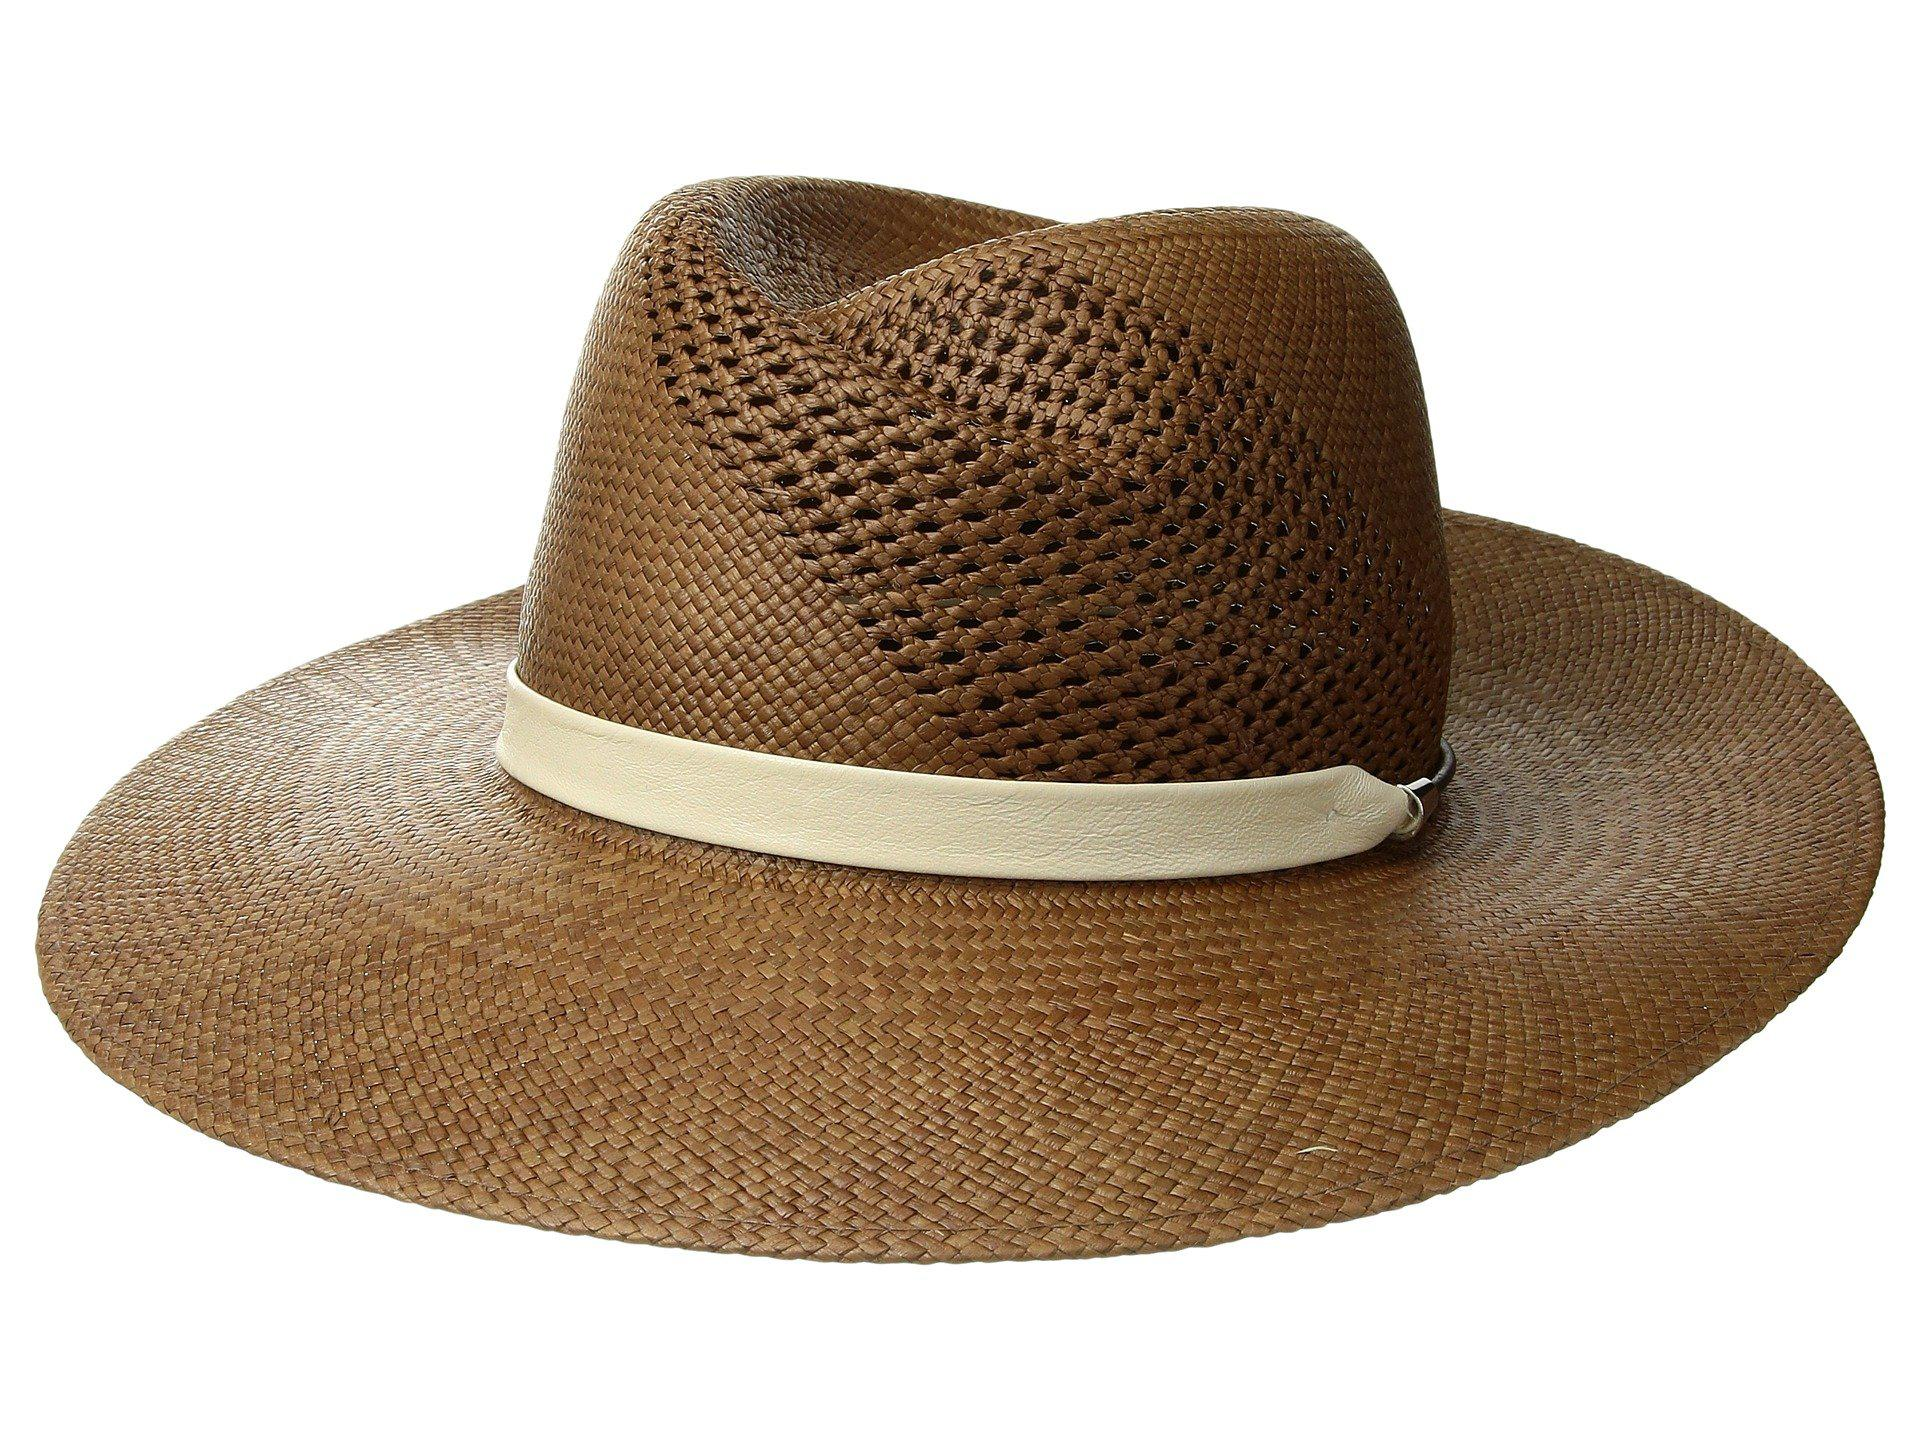 45f2bbf2db6221 Rag & Bone Zoe Straw Fedora (brown) Fedora Hats in Brown - Lyst